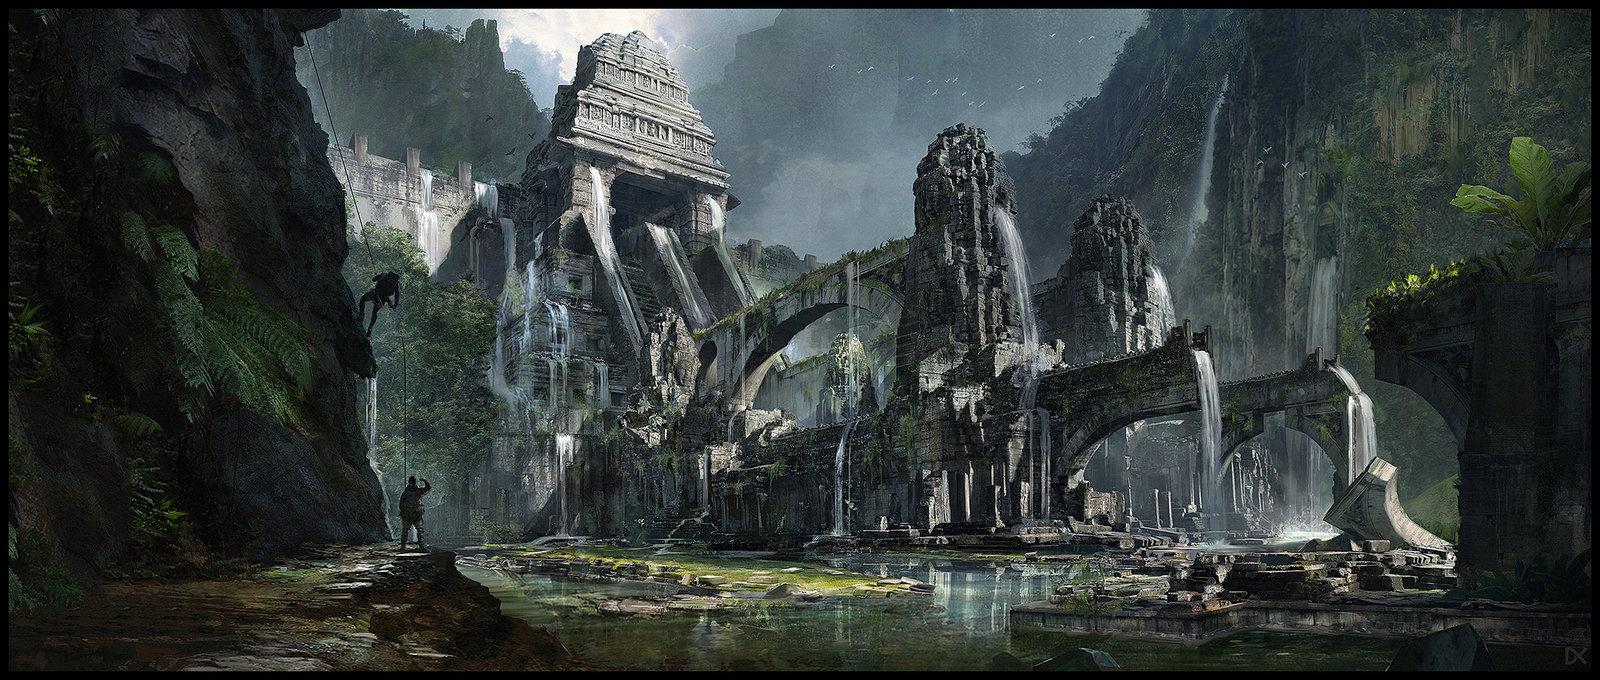 Atlantis Entrance